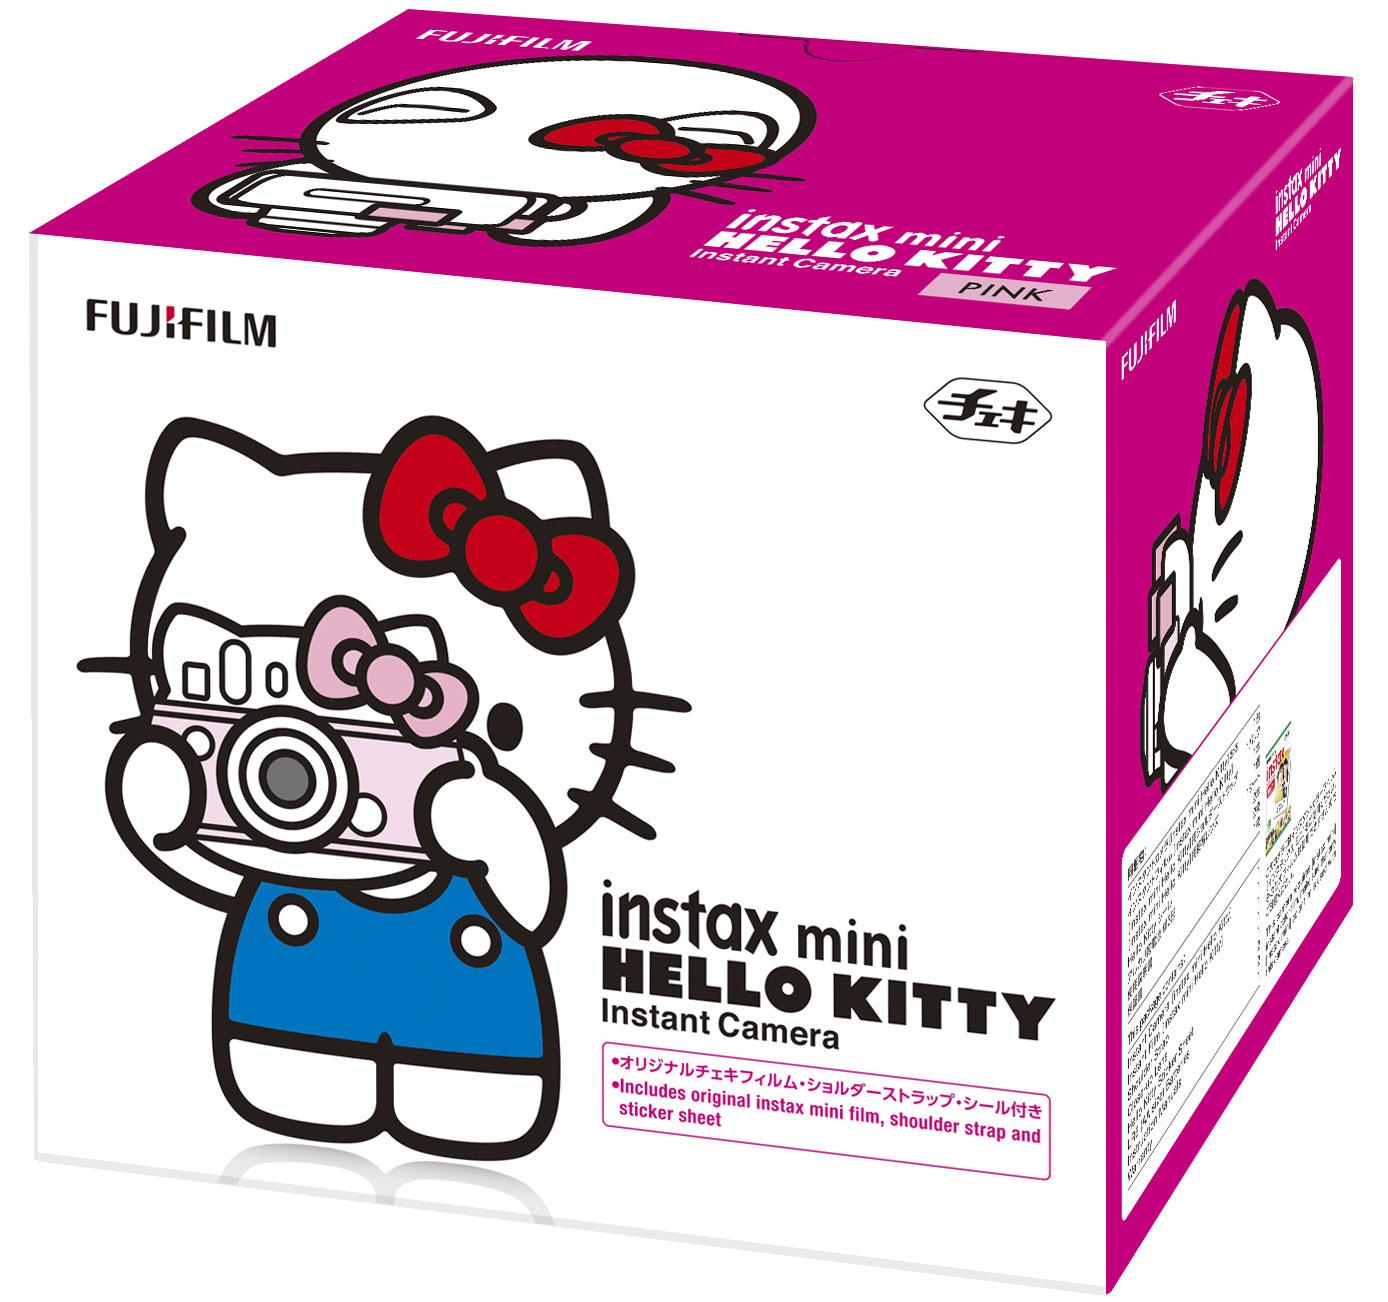 Набор Instax Mini Set Hello Kitty, Pink Fujifilm